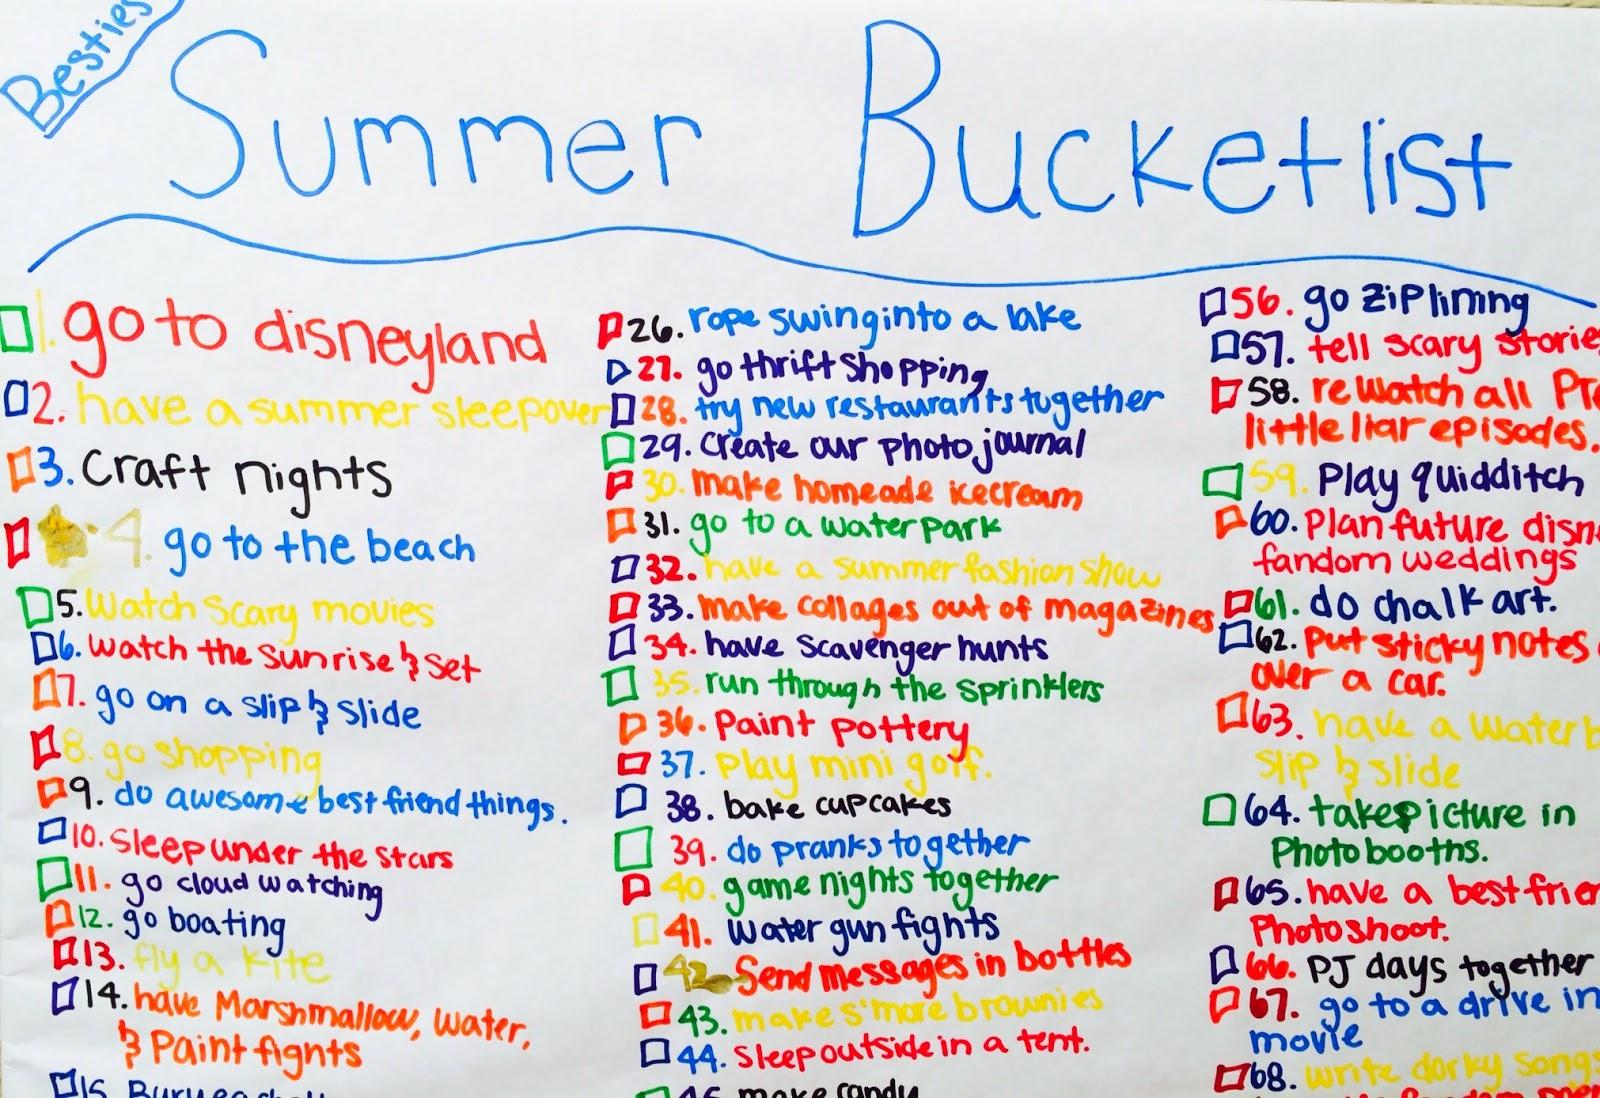 Hot Girl Summer Bucket List